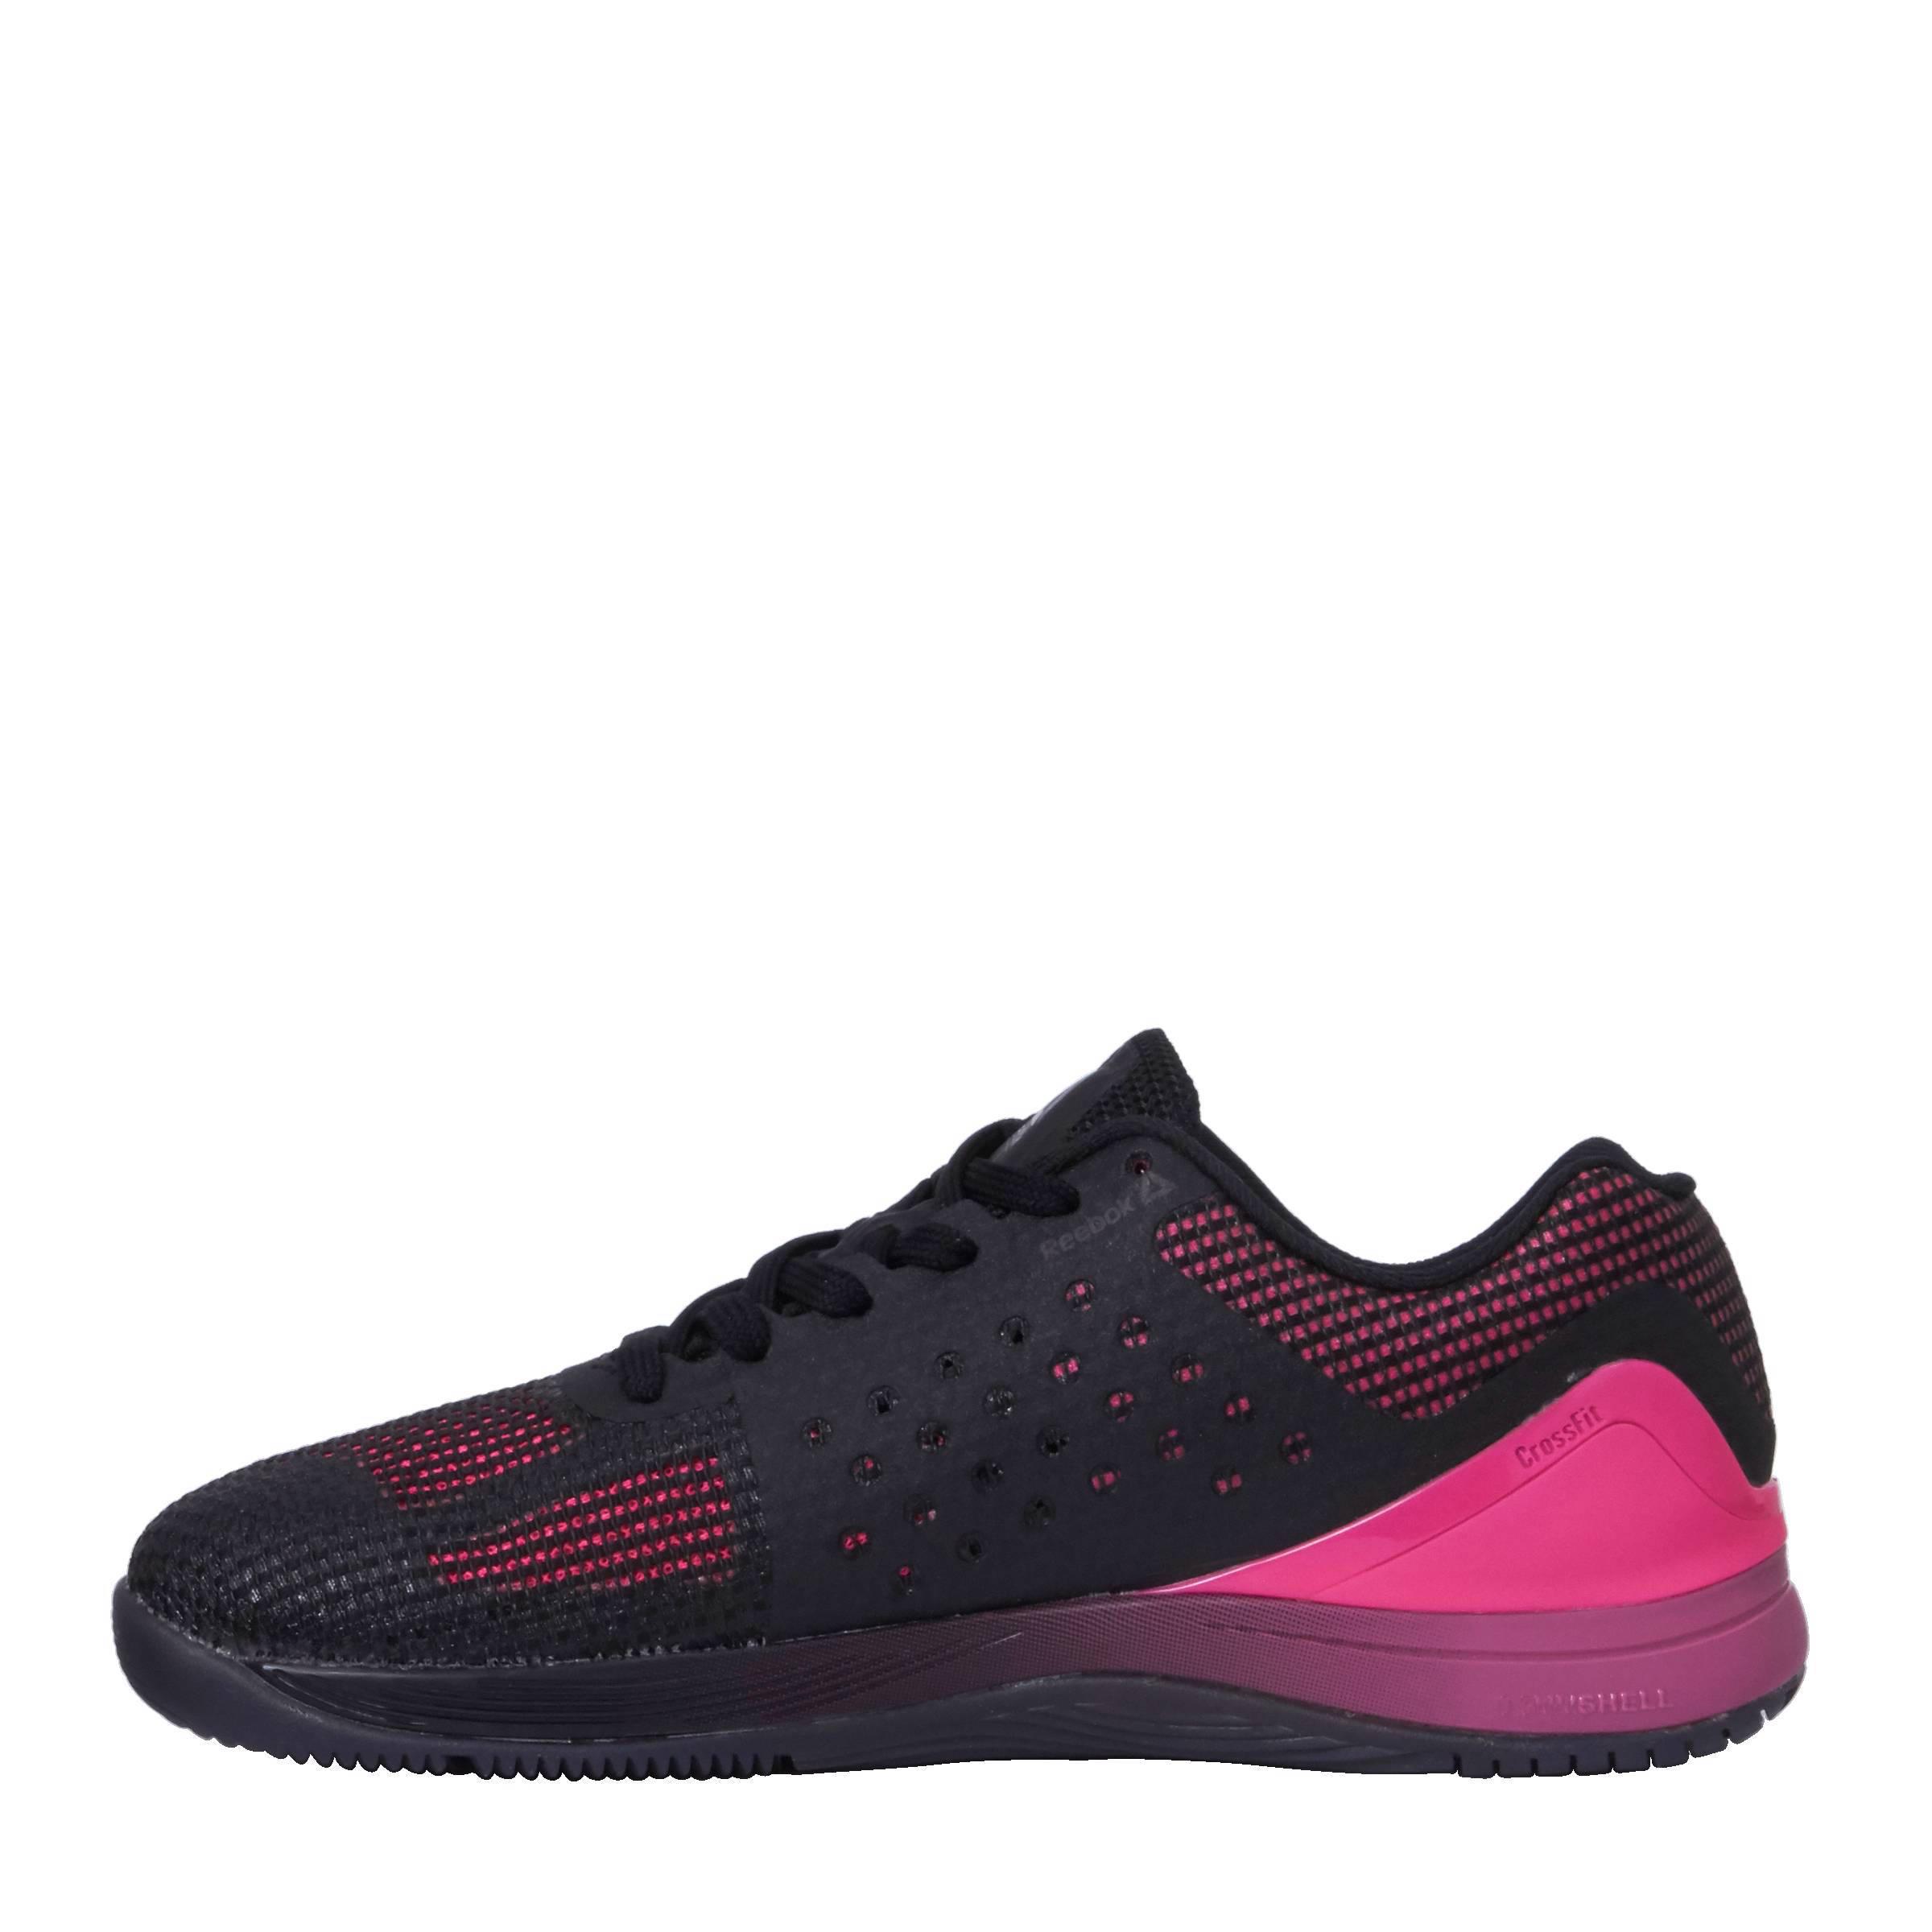 4e51572ac1b Reebok CrossFit Nano 7.0 fitness schoenen | wehkamp